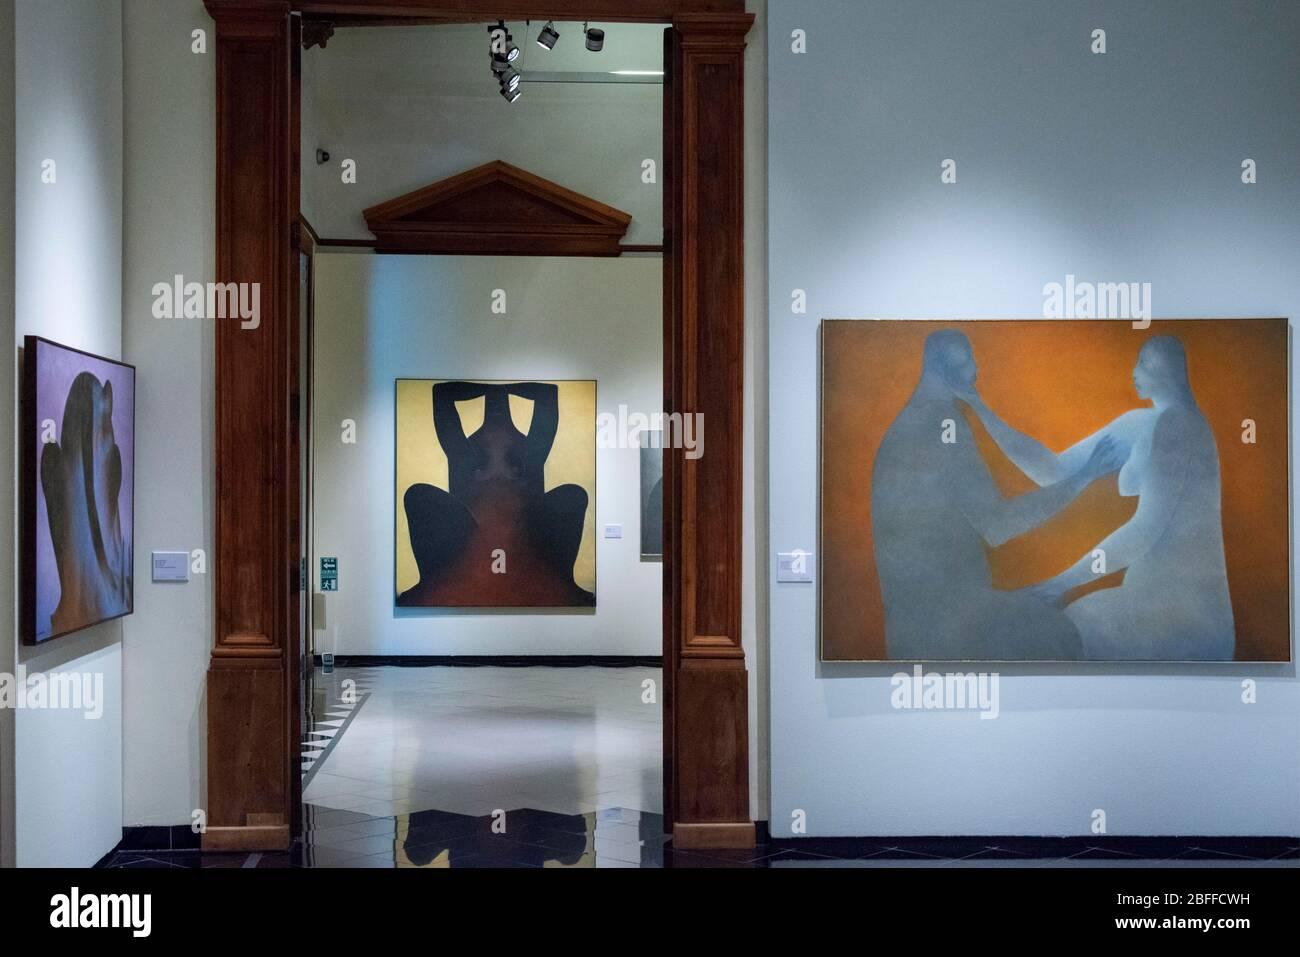 Ricardo Martinez paints exhibition Inside Casa de Montejo museum in Zocalo square in Merida, the capital city of the Yucatan, Mexico Latin America.  C Stock Photo